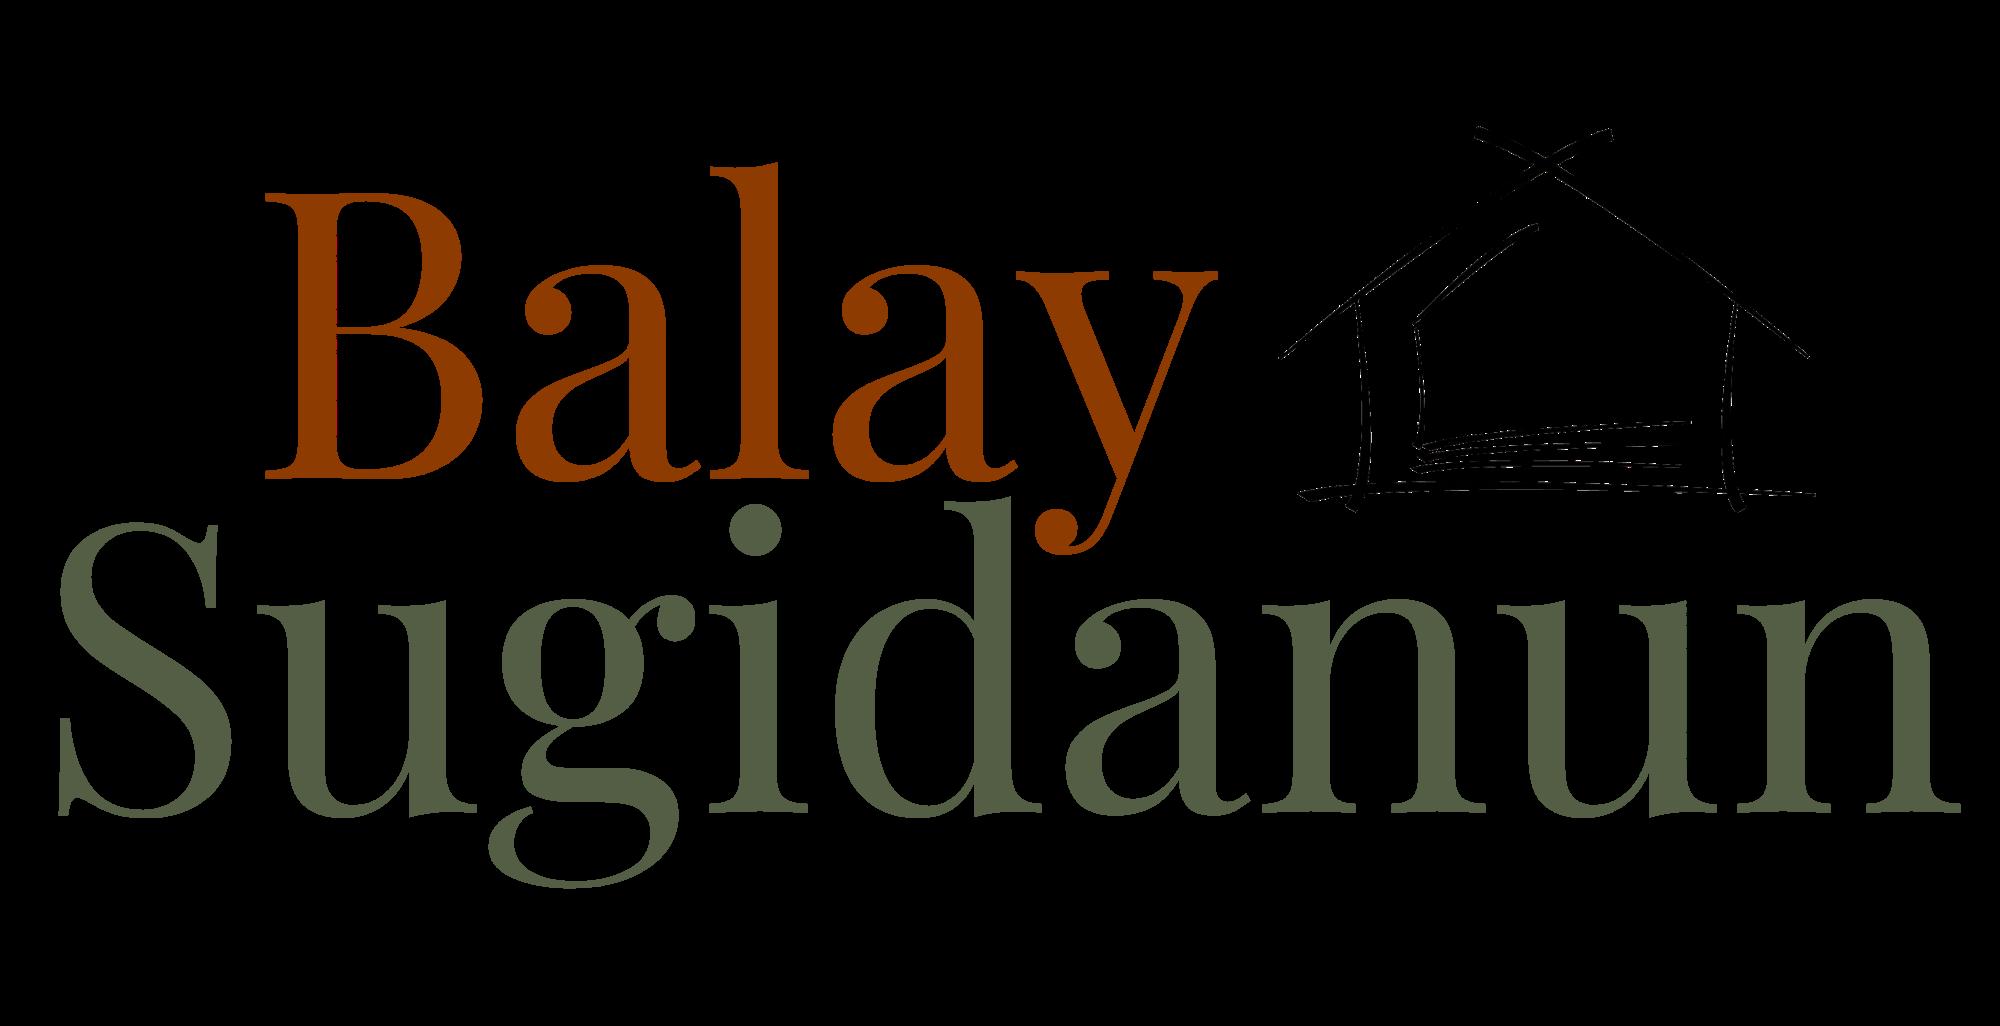 Balay Sugidanun